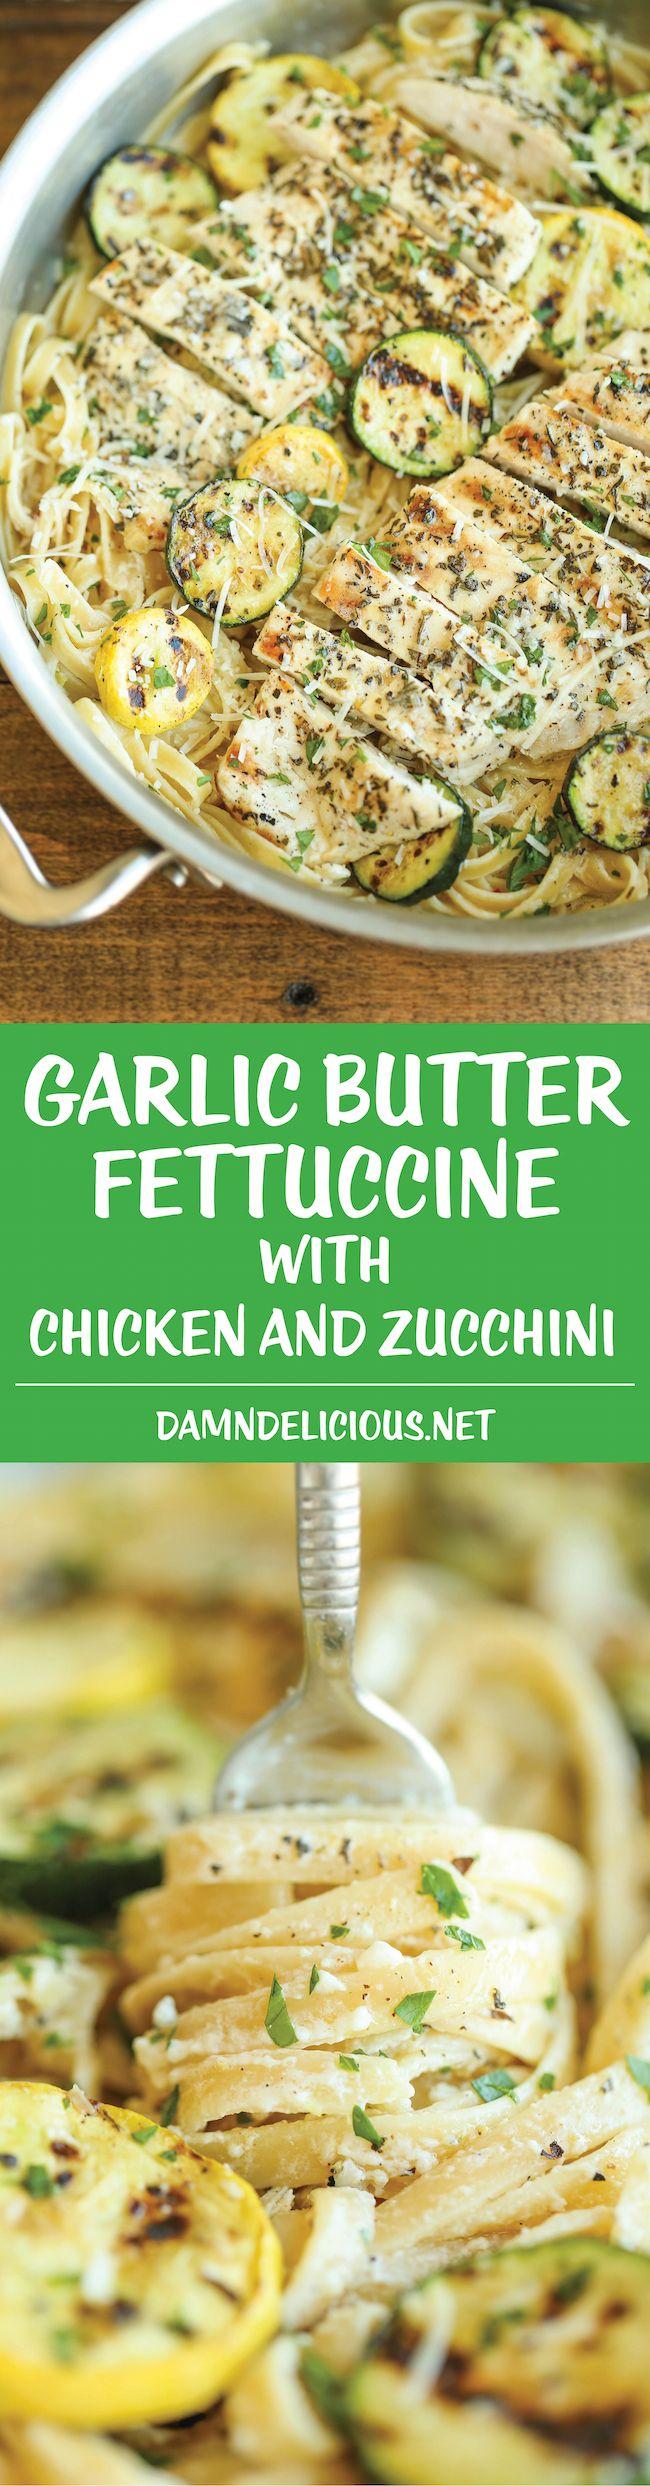 Garlic Butter Fettuccine with Chicken and Zucchini